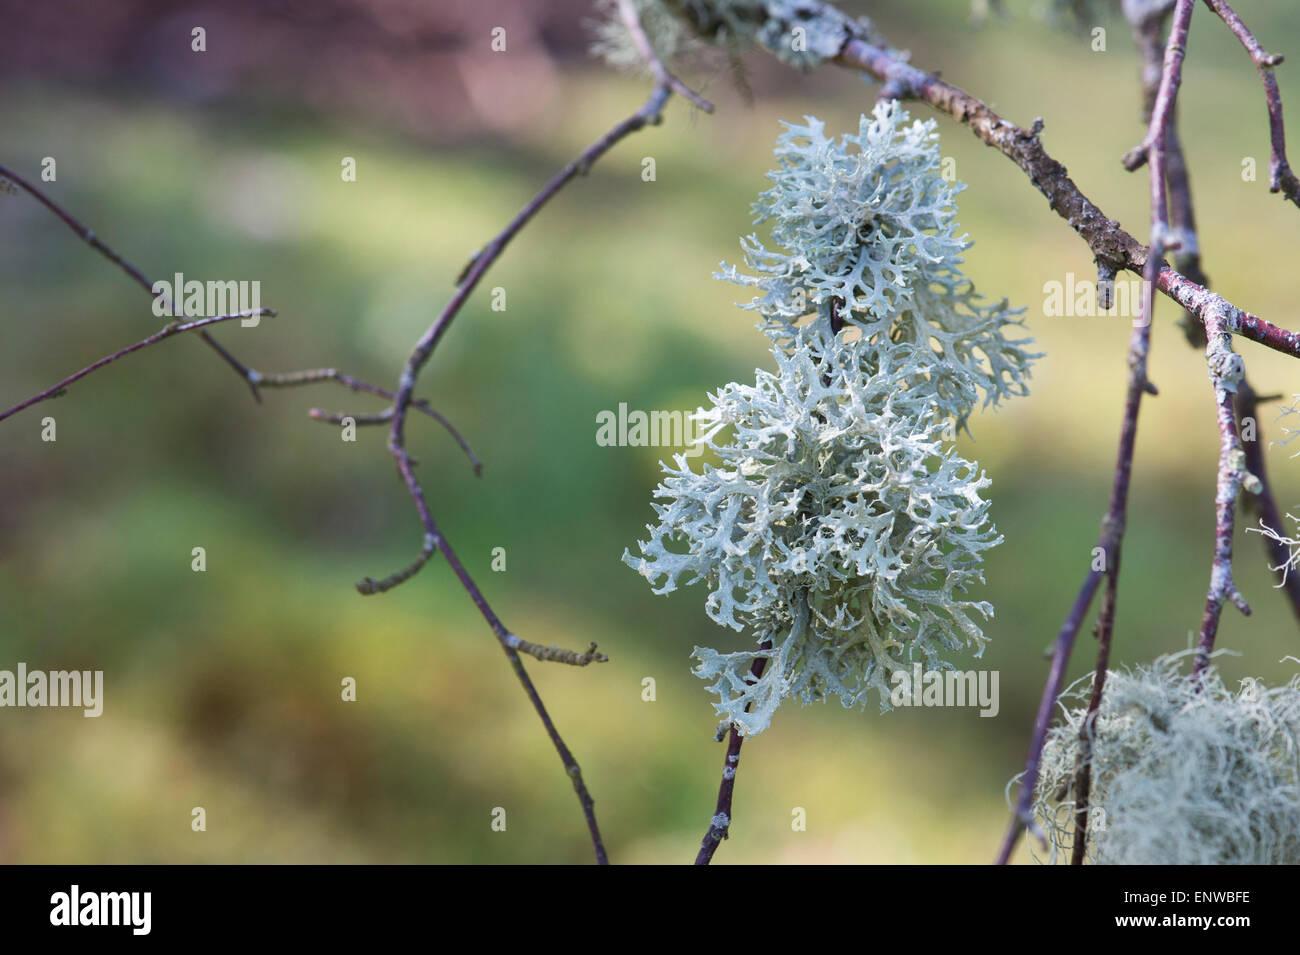 Lichen on a silver birch tree in Scotland. Non parasitic plant like organism - Stock Image